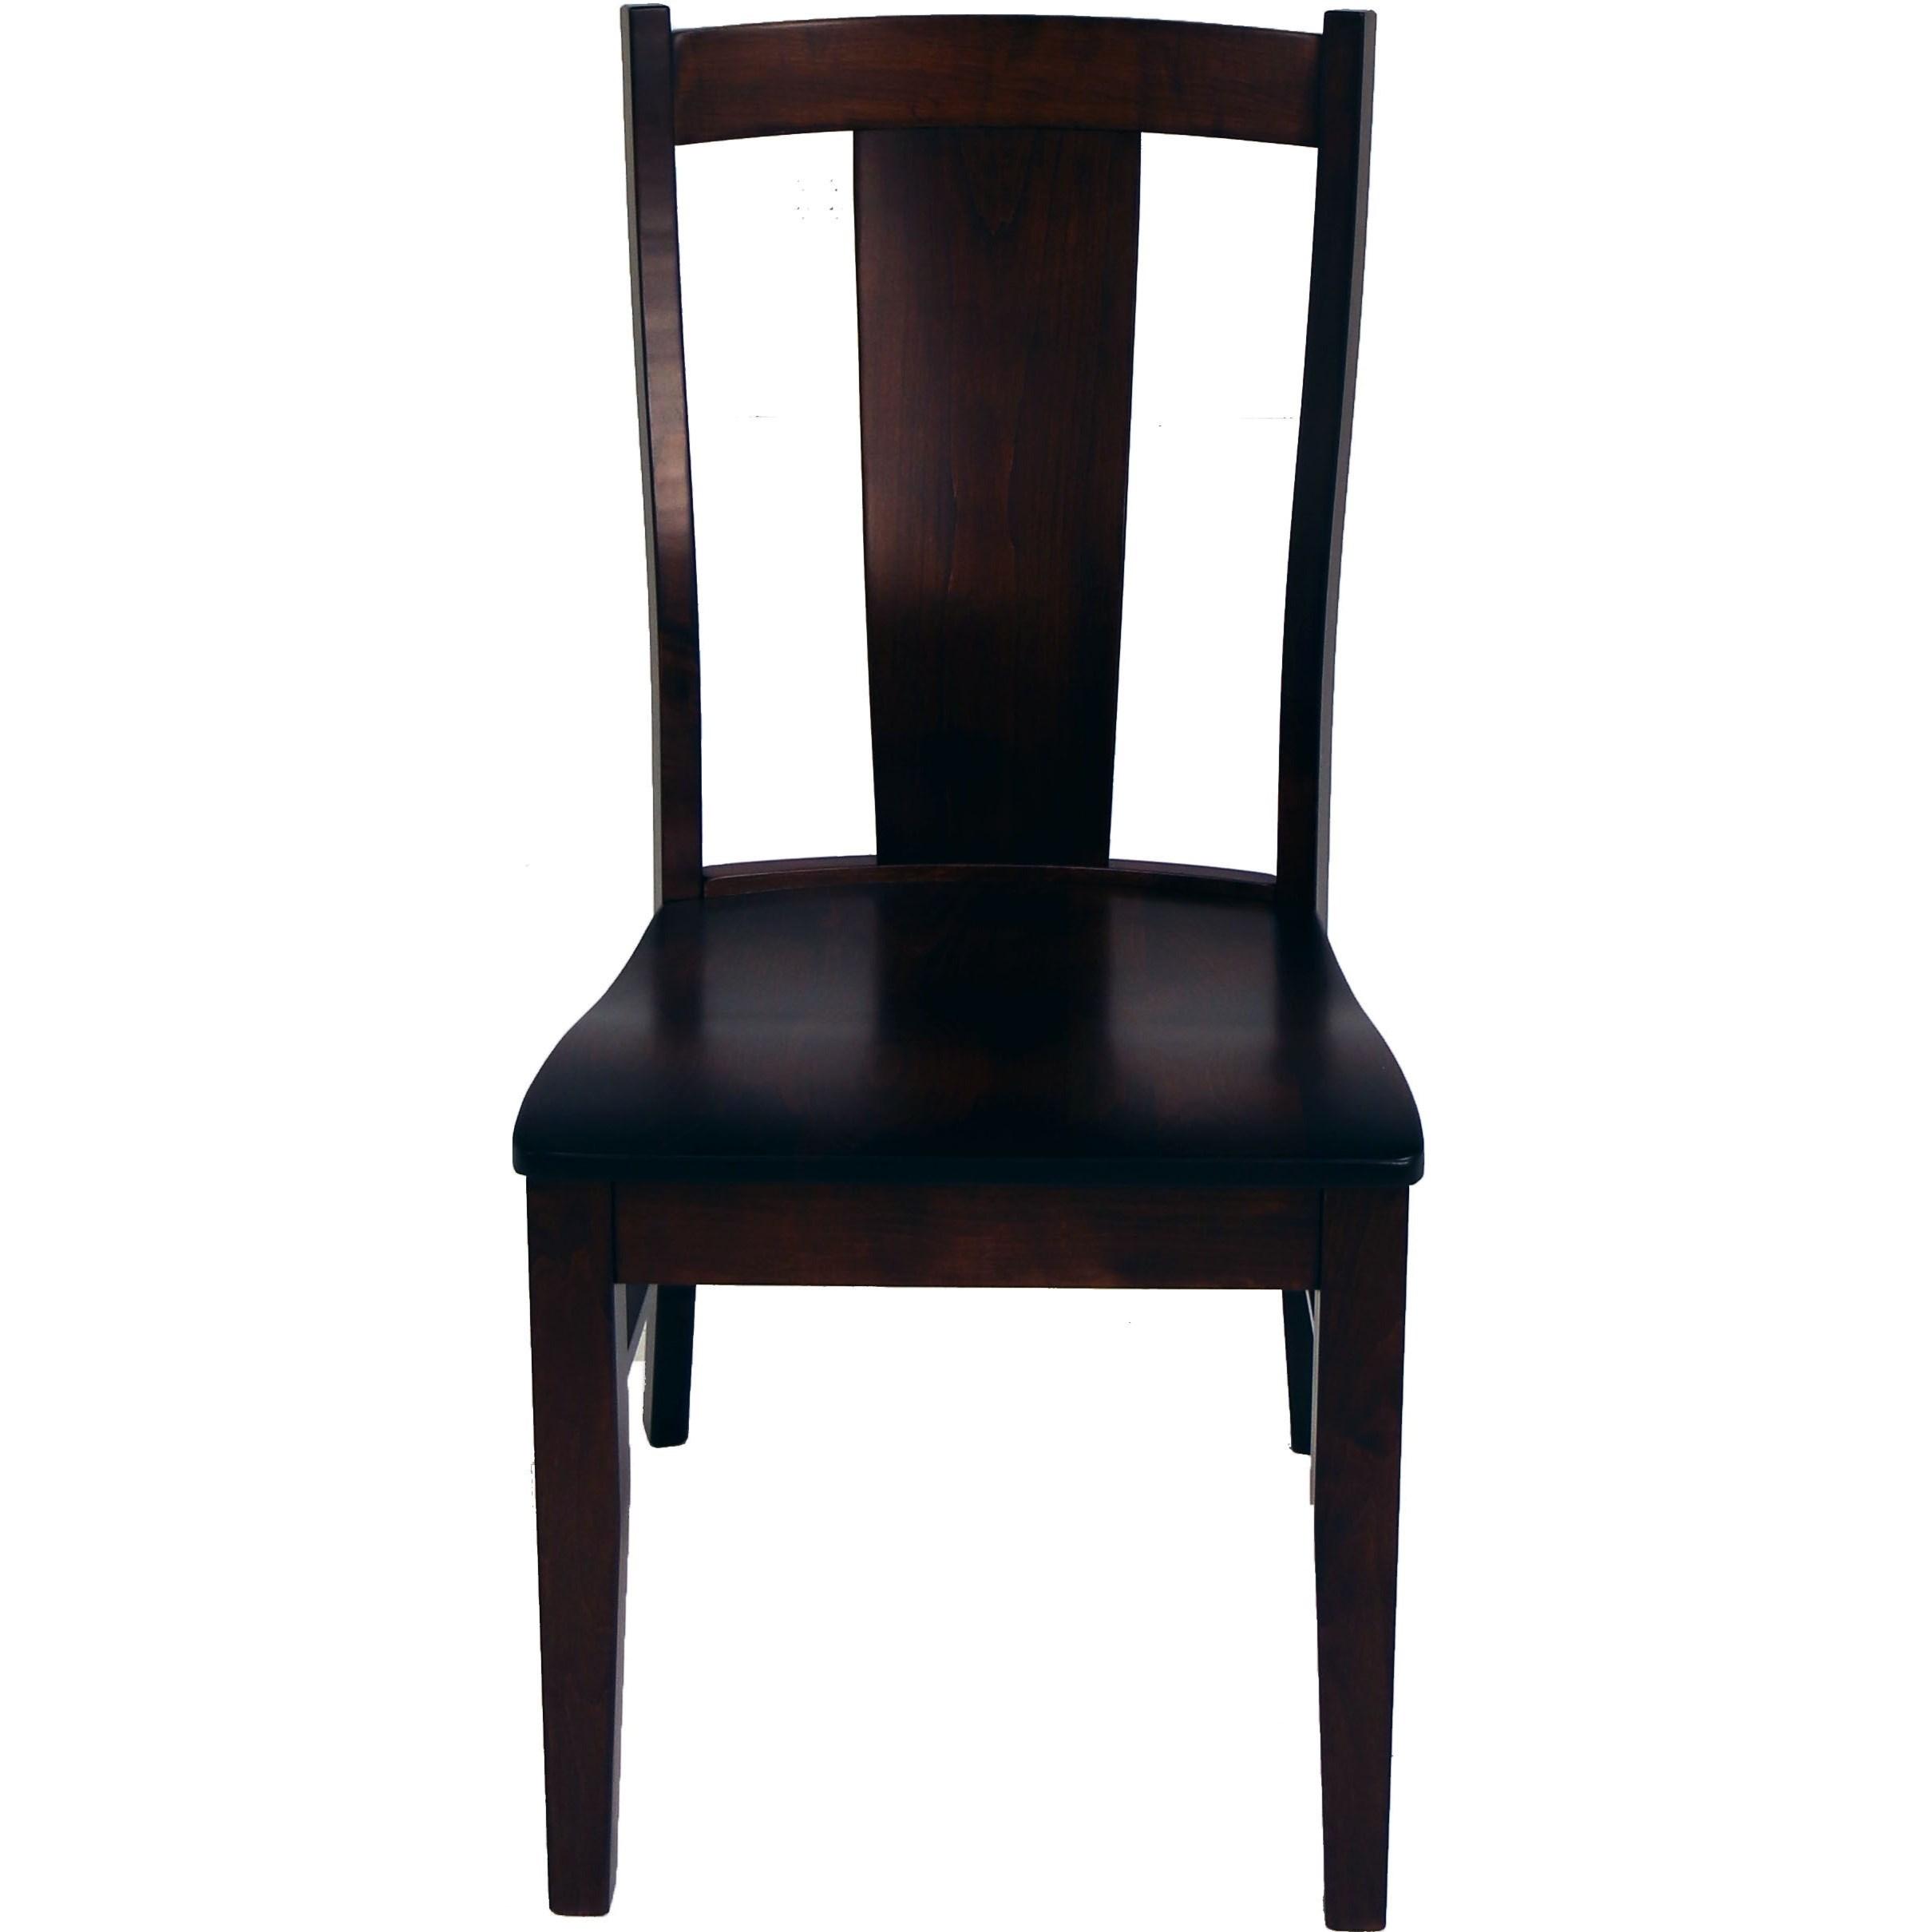 Amish Essentials Lucas Chair by Archbold Furniture at Mueller Furniture